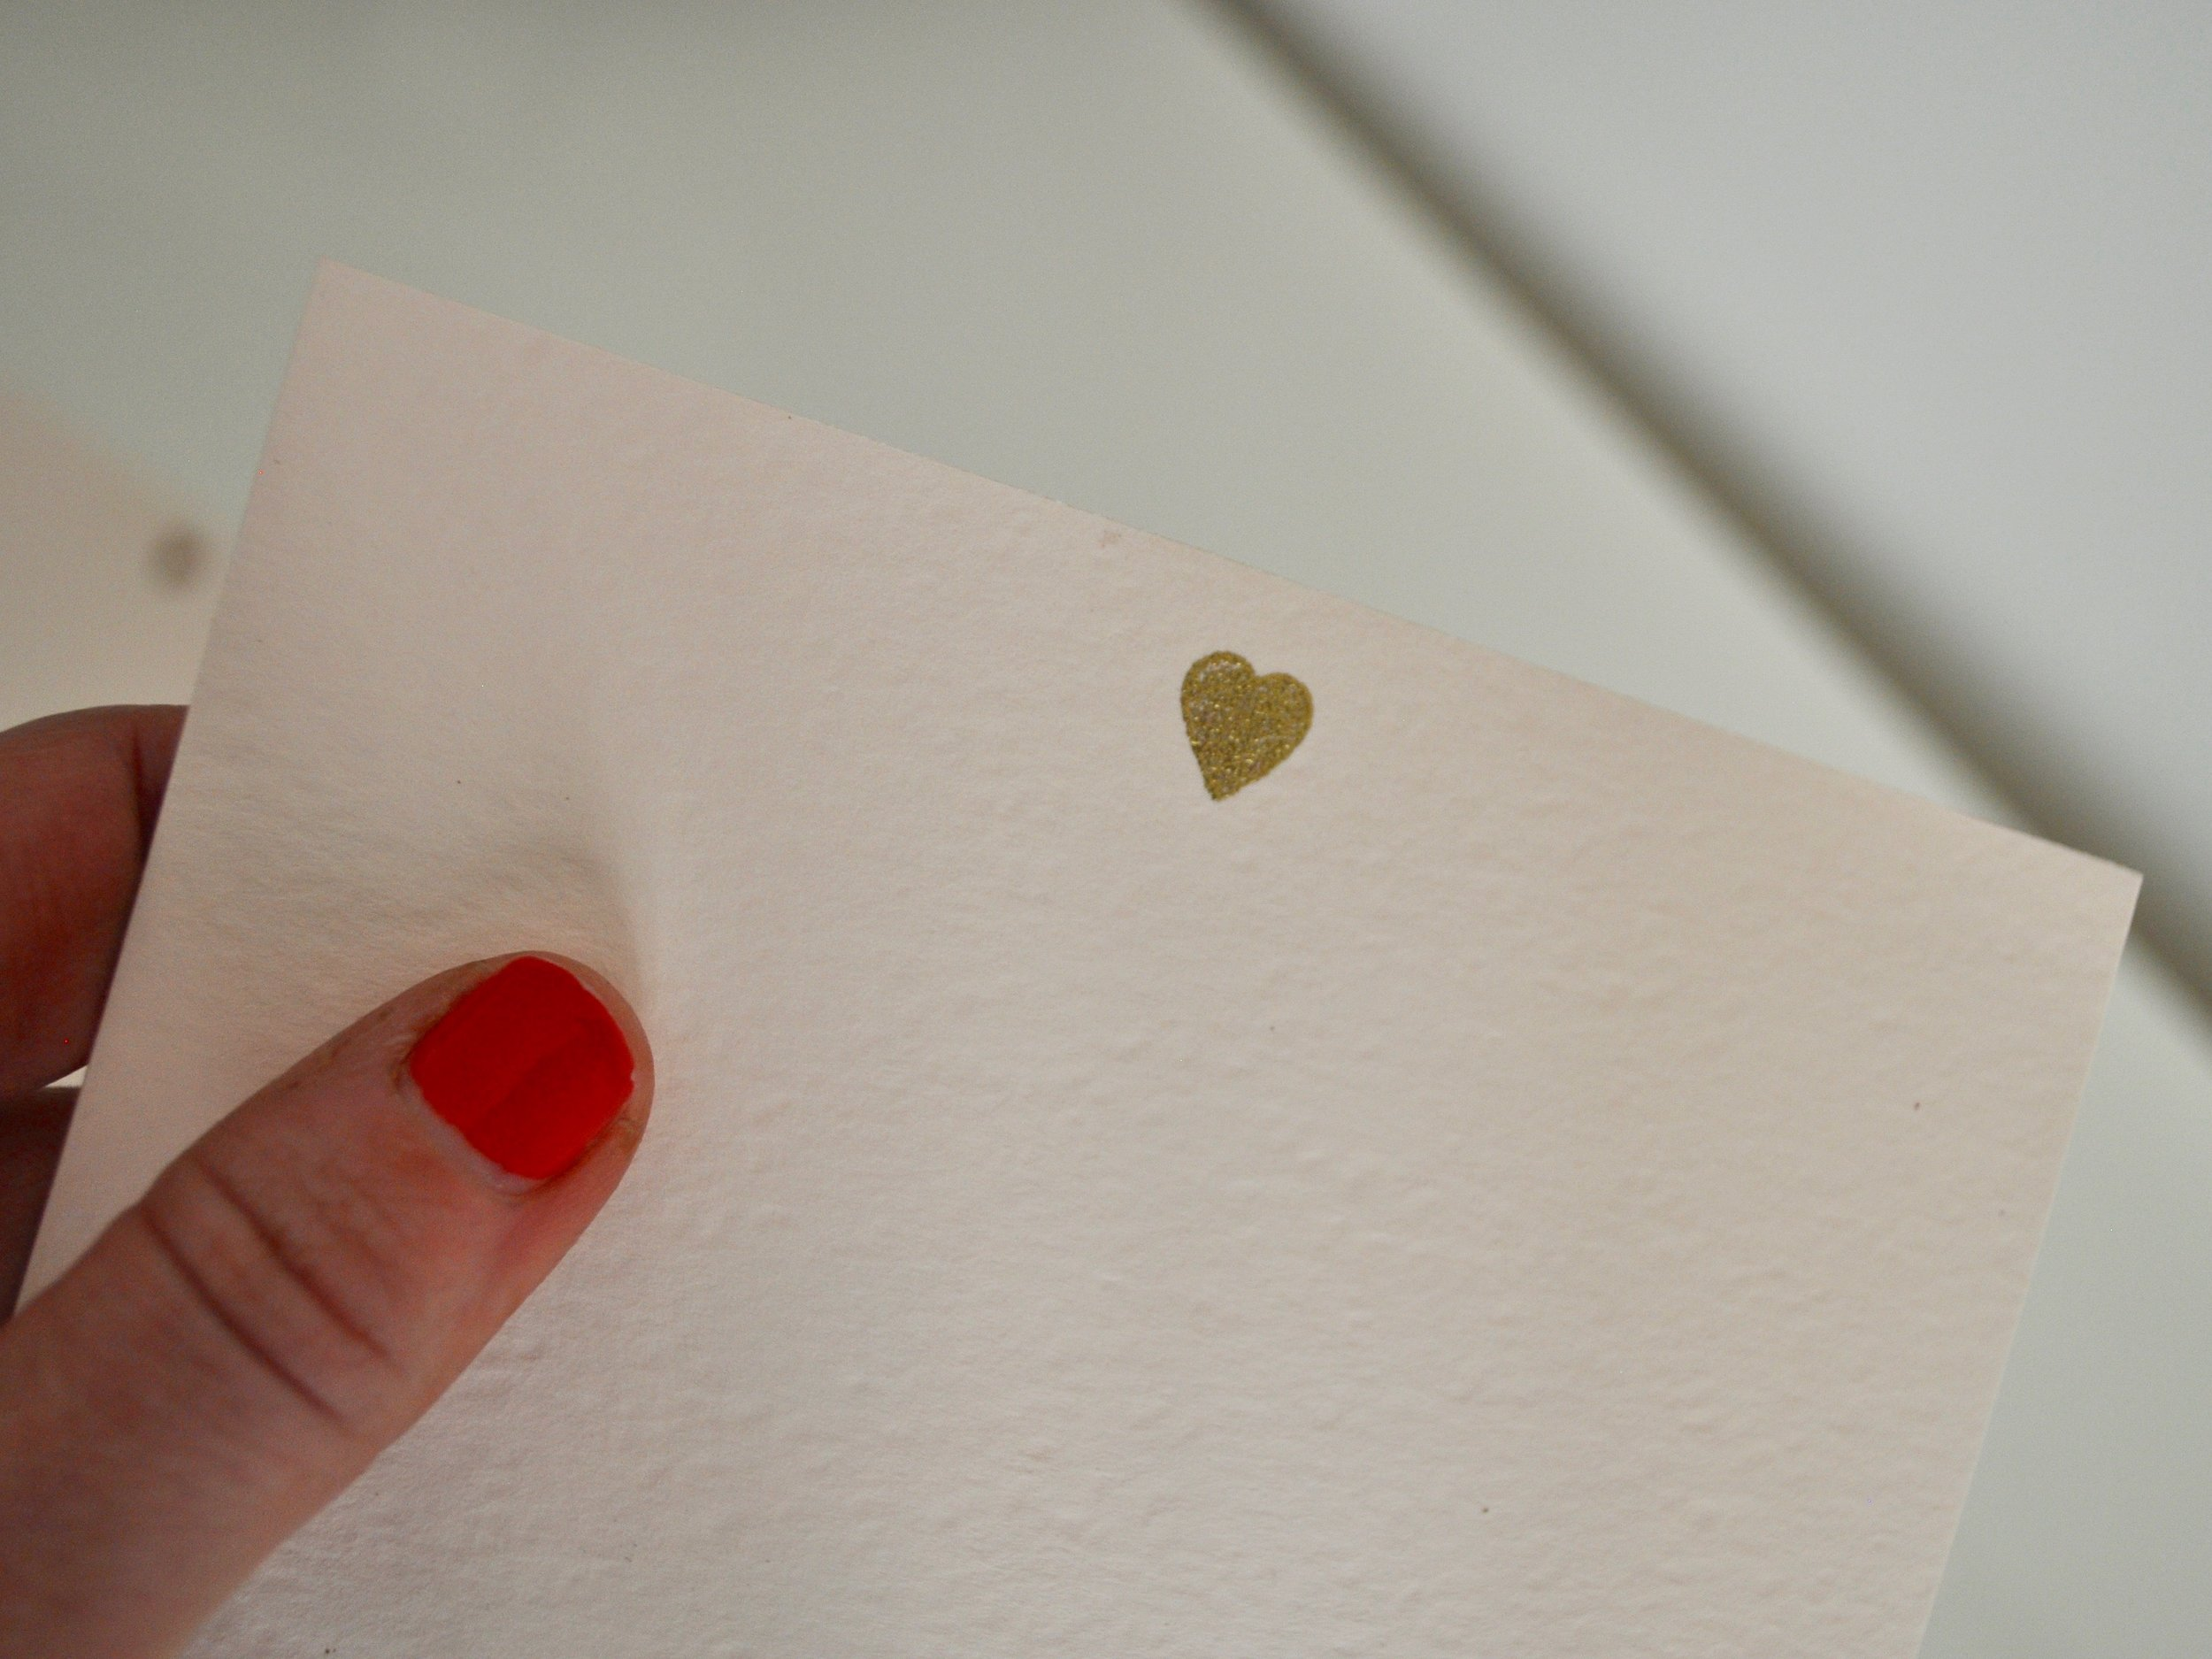 Embossed Heart Stationery | @beesandbubbles